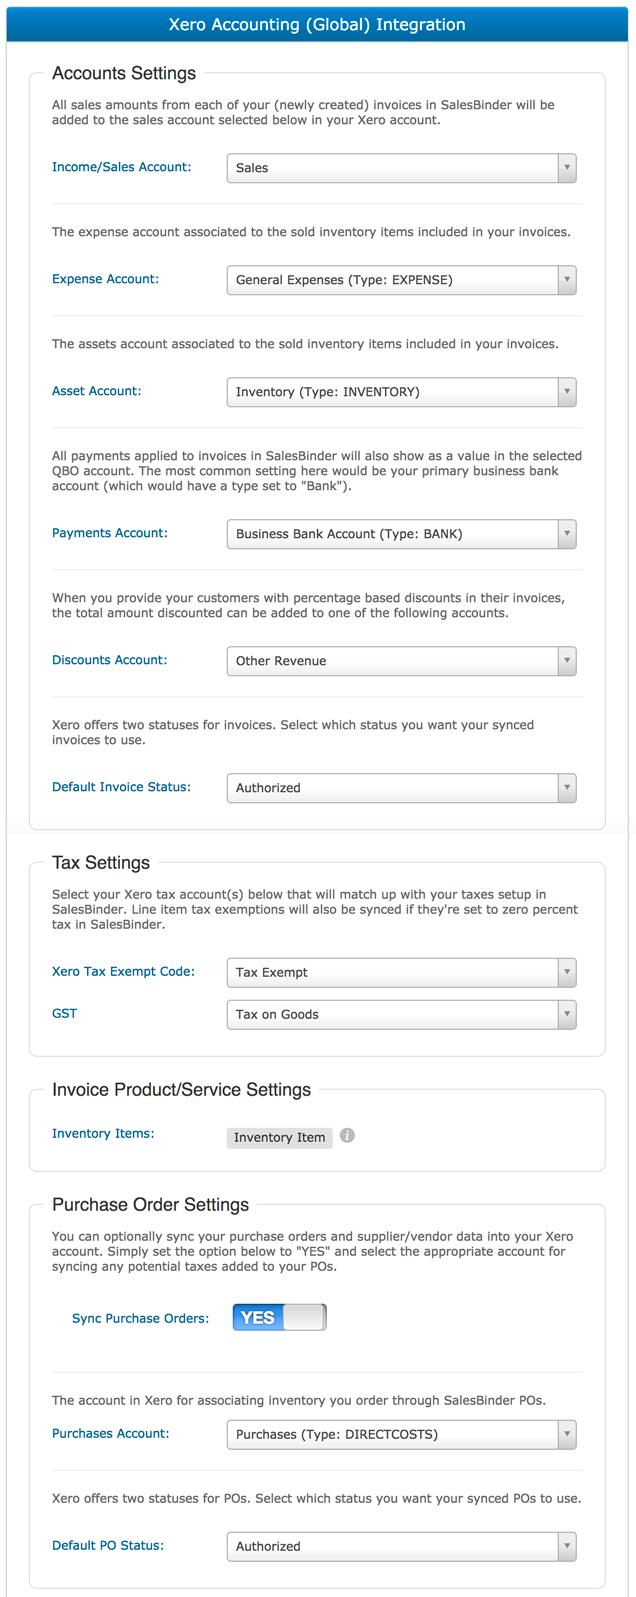 Xero Accounting Integration